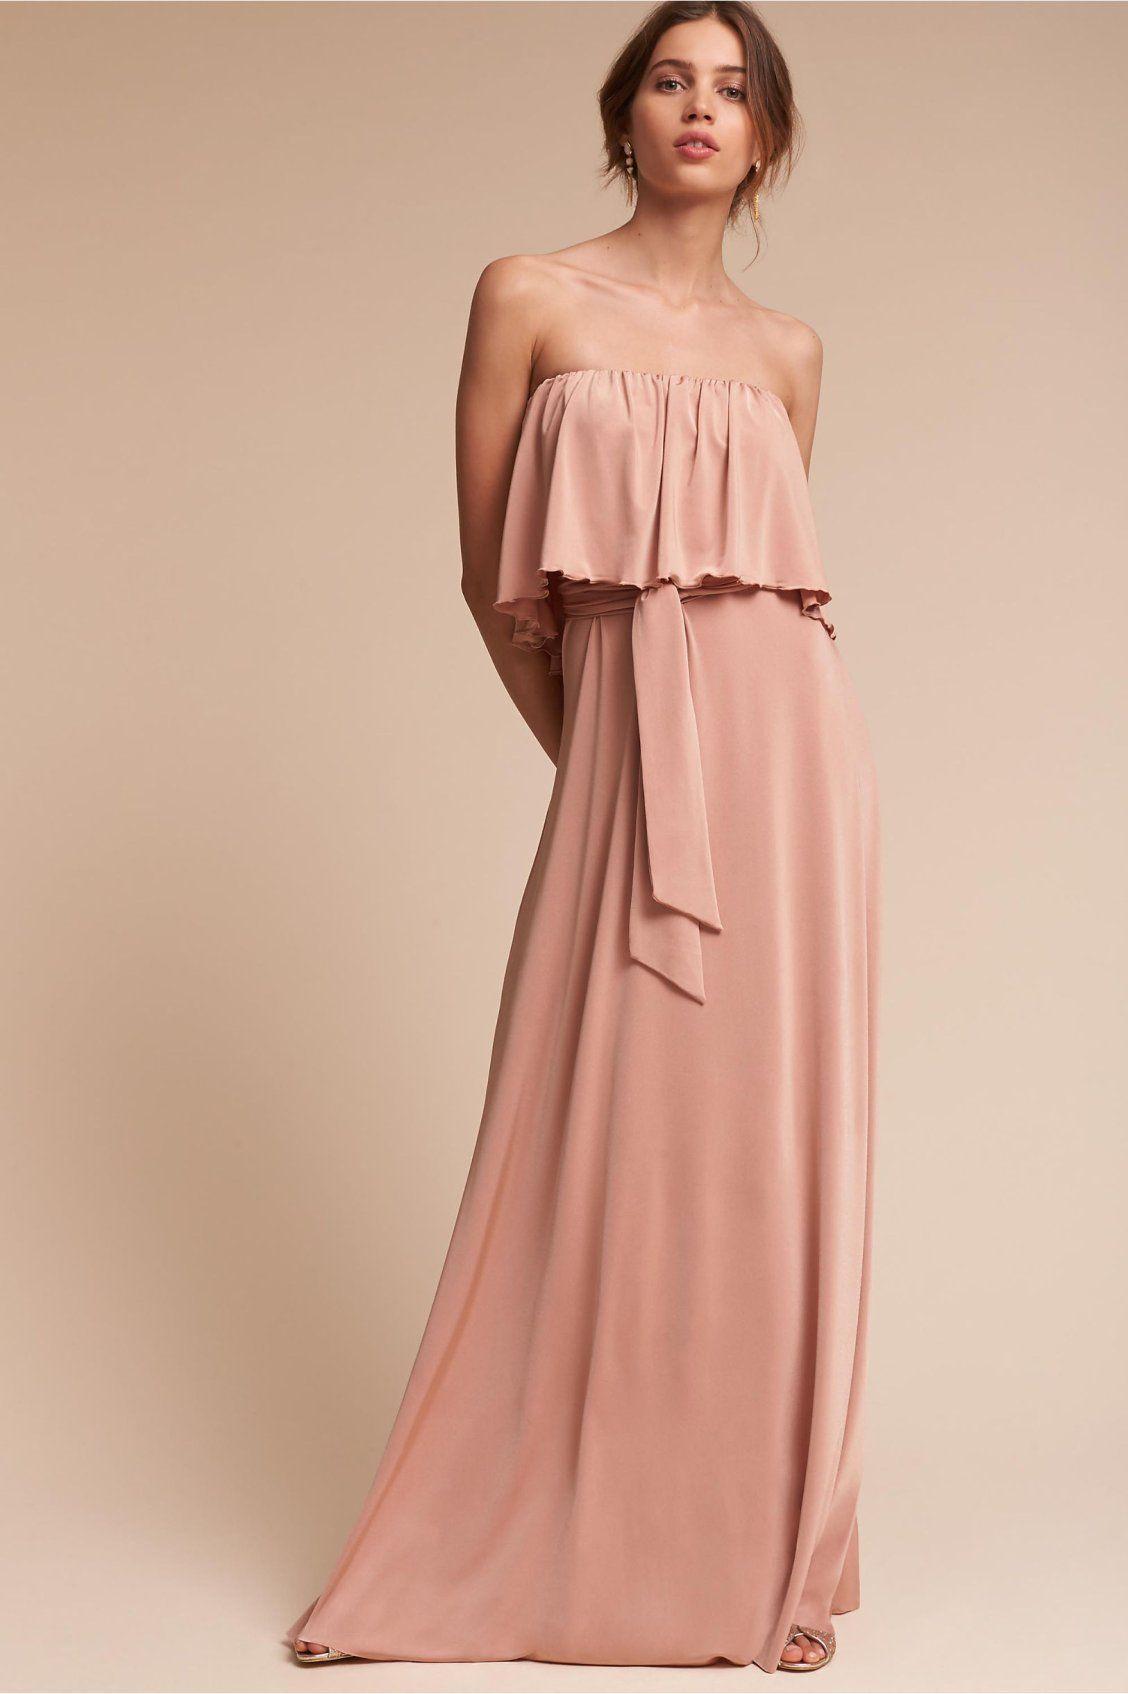 Dress for party wedding  Maya Dress from BHLDN  Summer Wedding Ideas  Pinterest  Maya